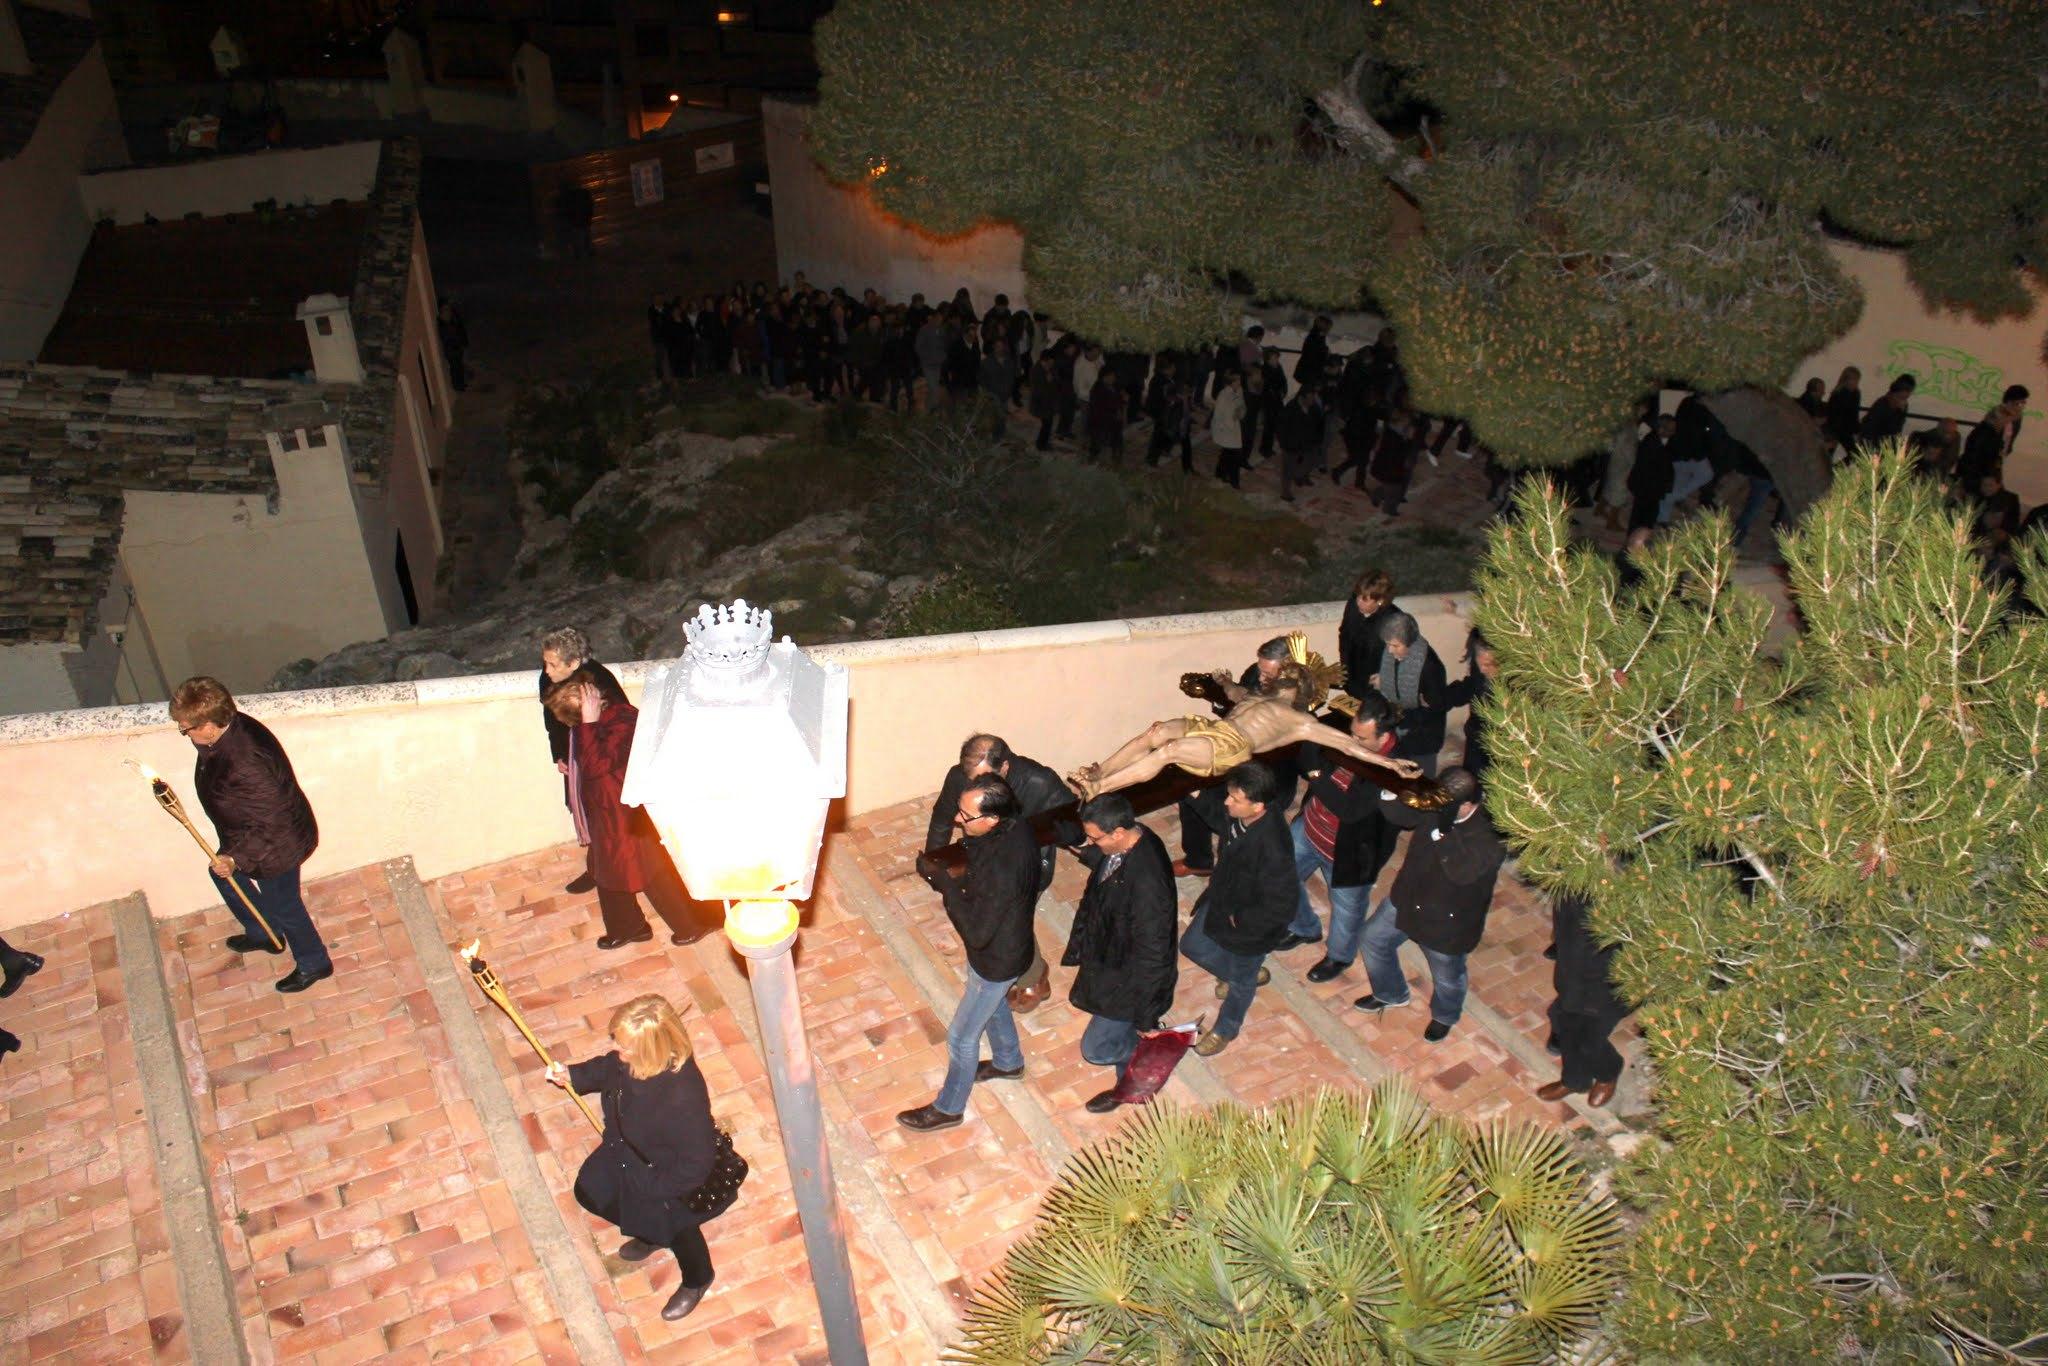 (2013-03-22) - IV Vía Crucis nocturno - Javier Romero Ripoll (207)